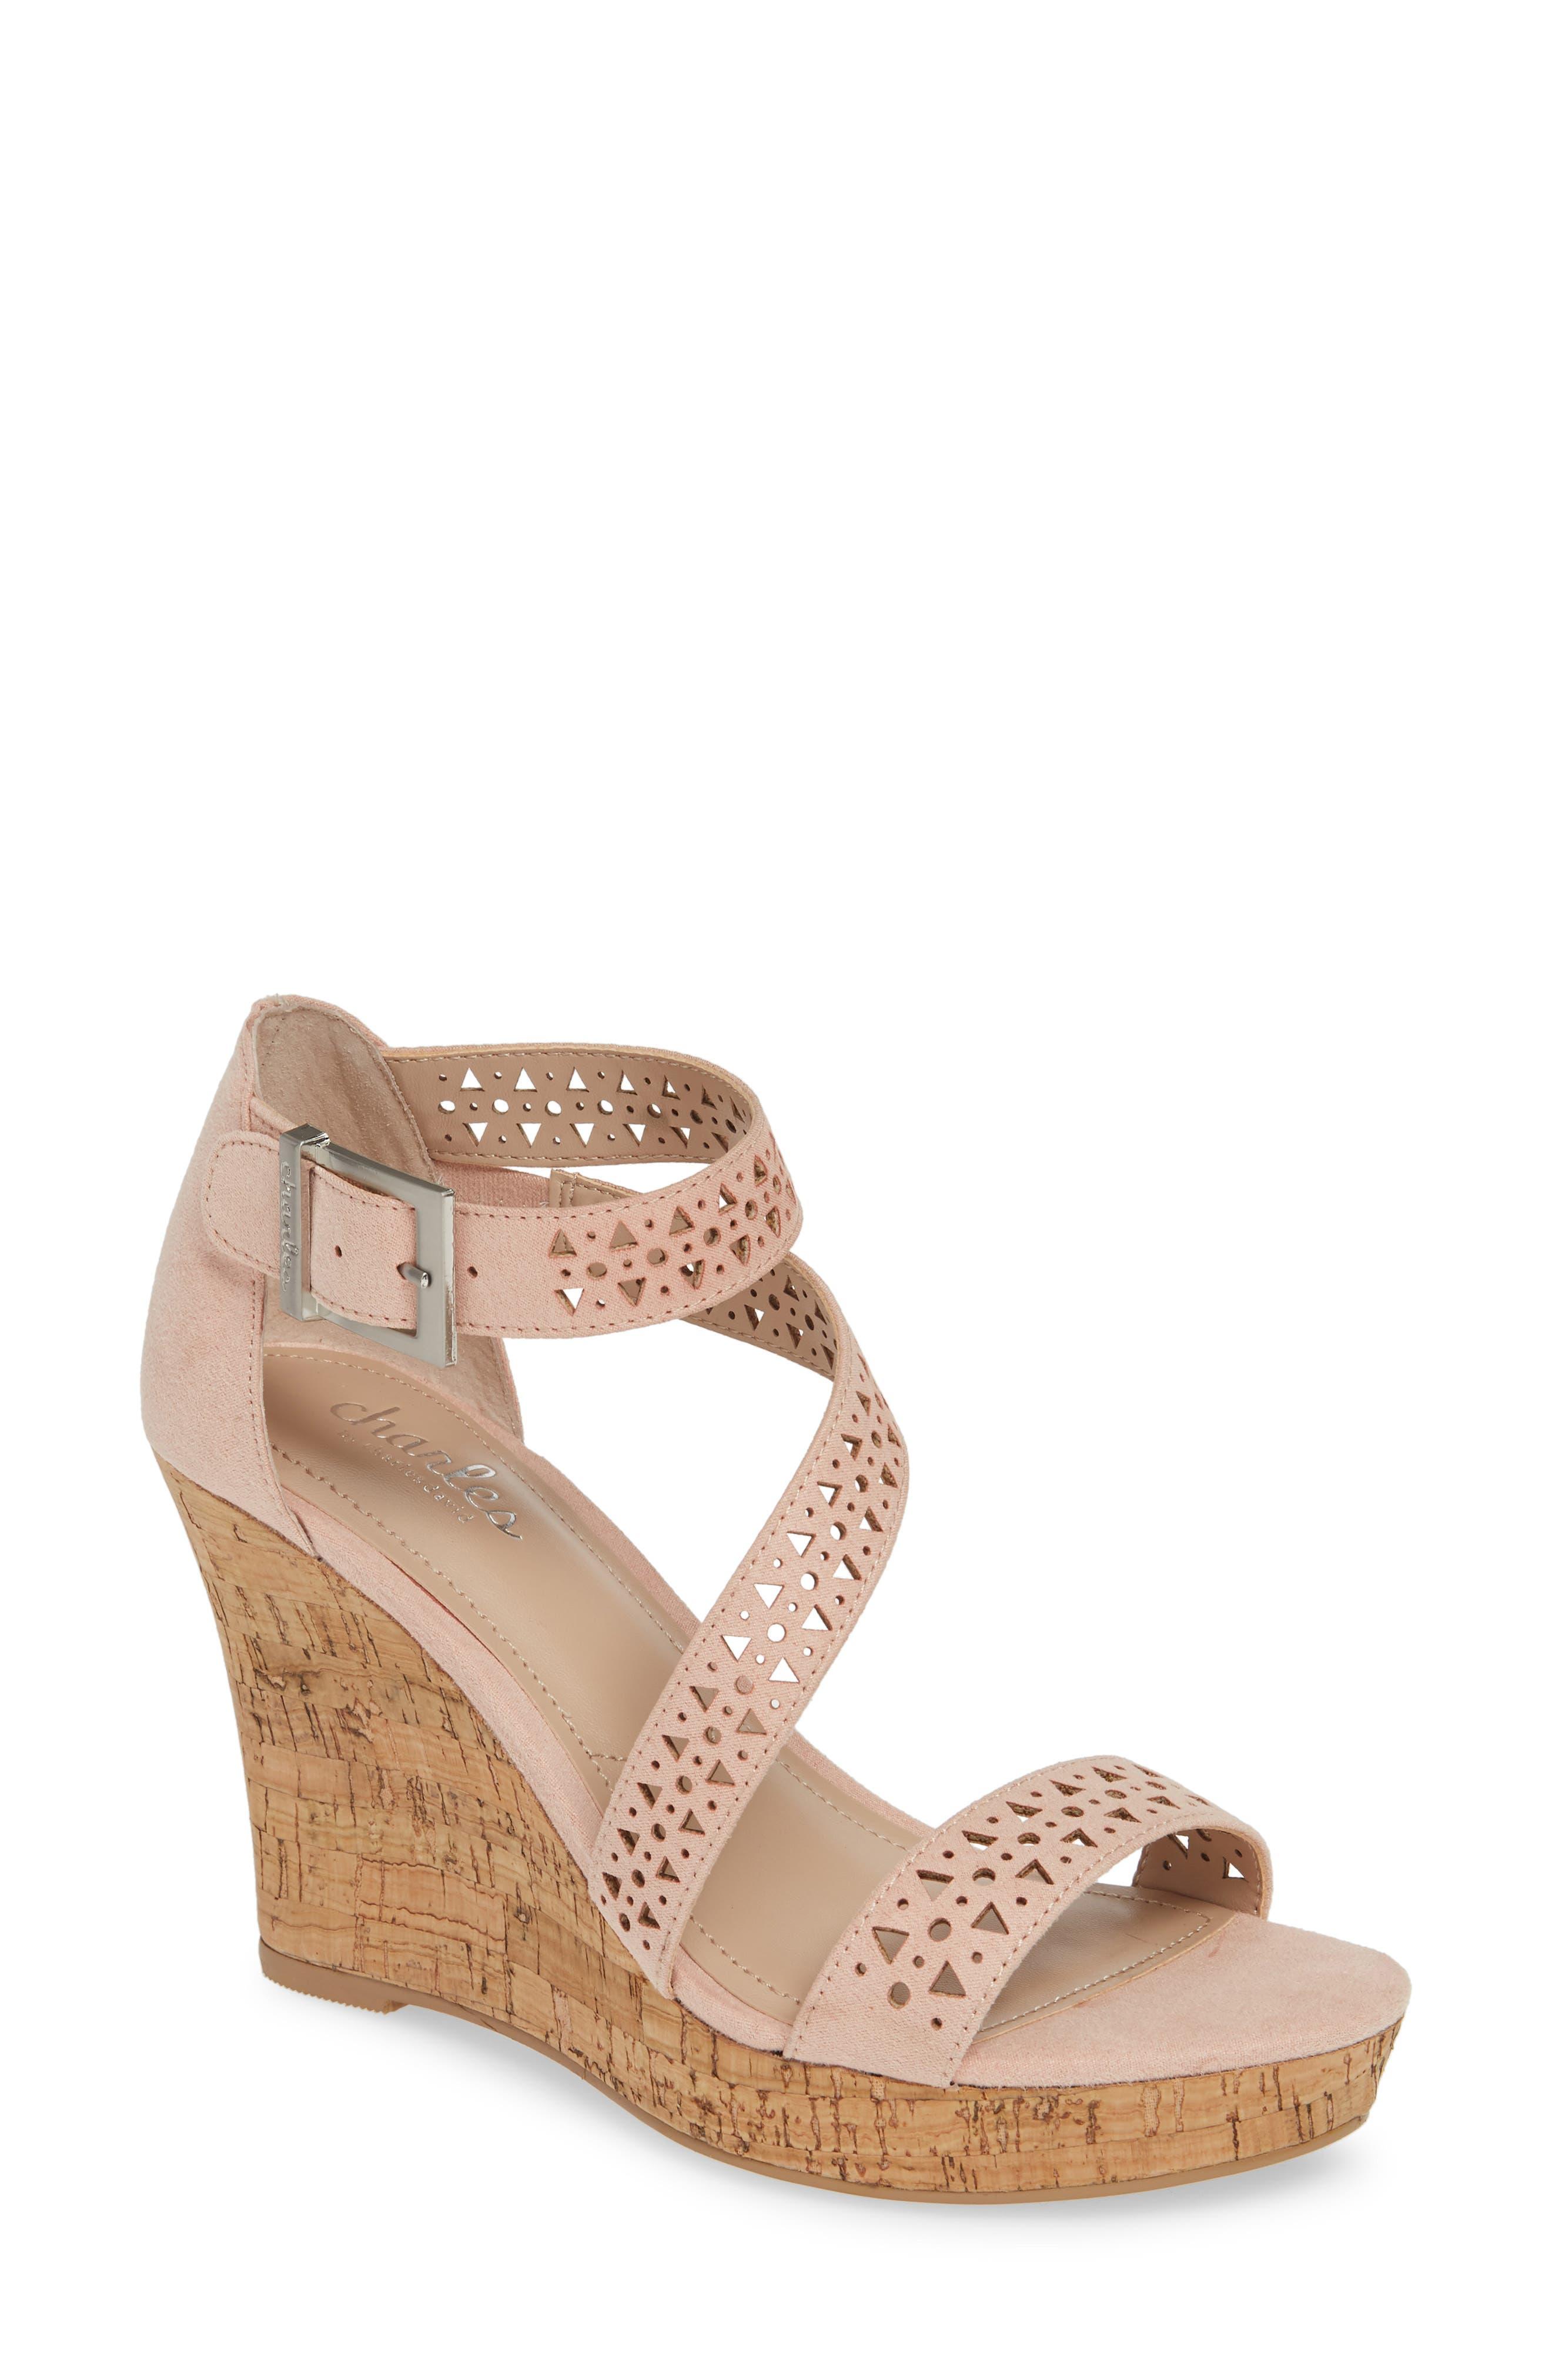 Charles By Charles David Landon Perforated Wedge Sandal, Pink